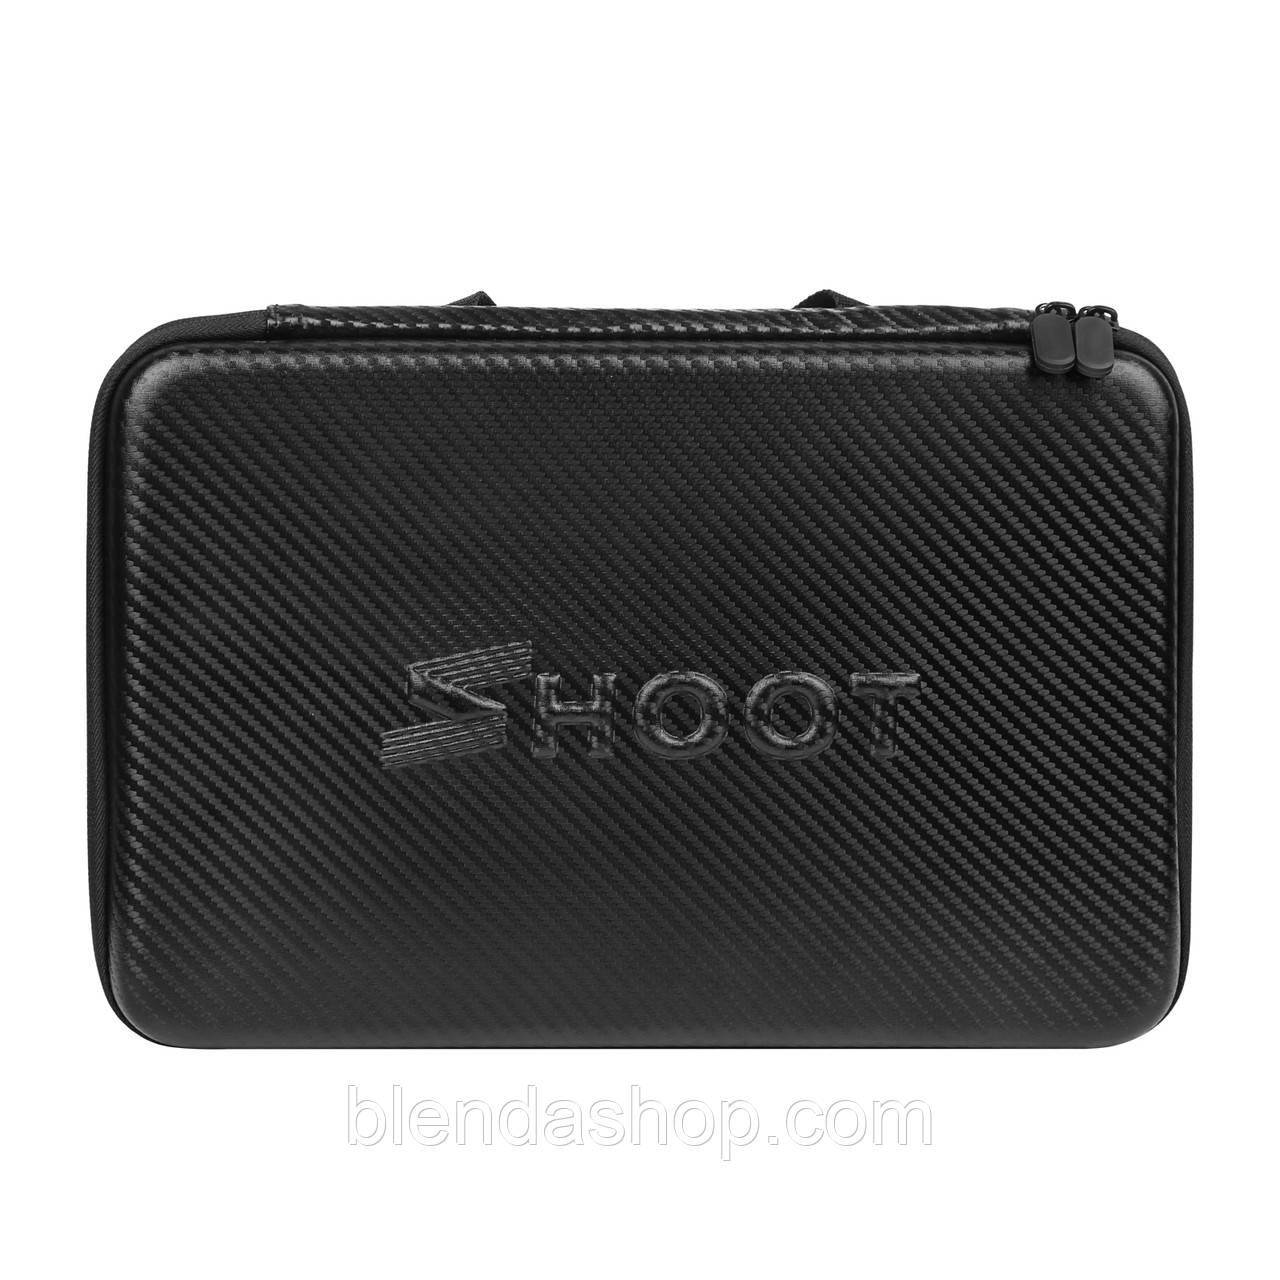 Кейс, футляр SHOOT для экшн-камер (32.5 х 21,7 х 6,5) для Gopro, SJCAM, Xiaomi и других камер (код № XTGP427)